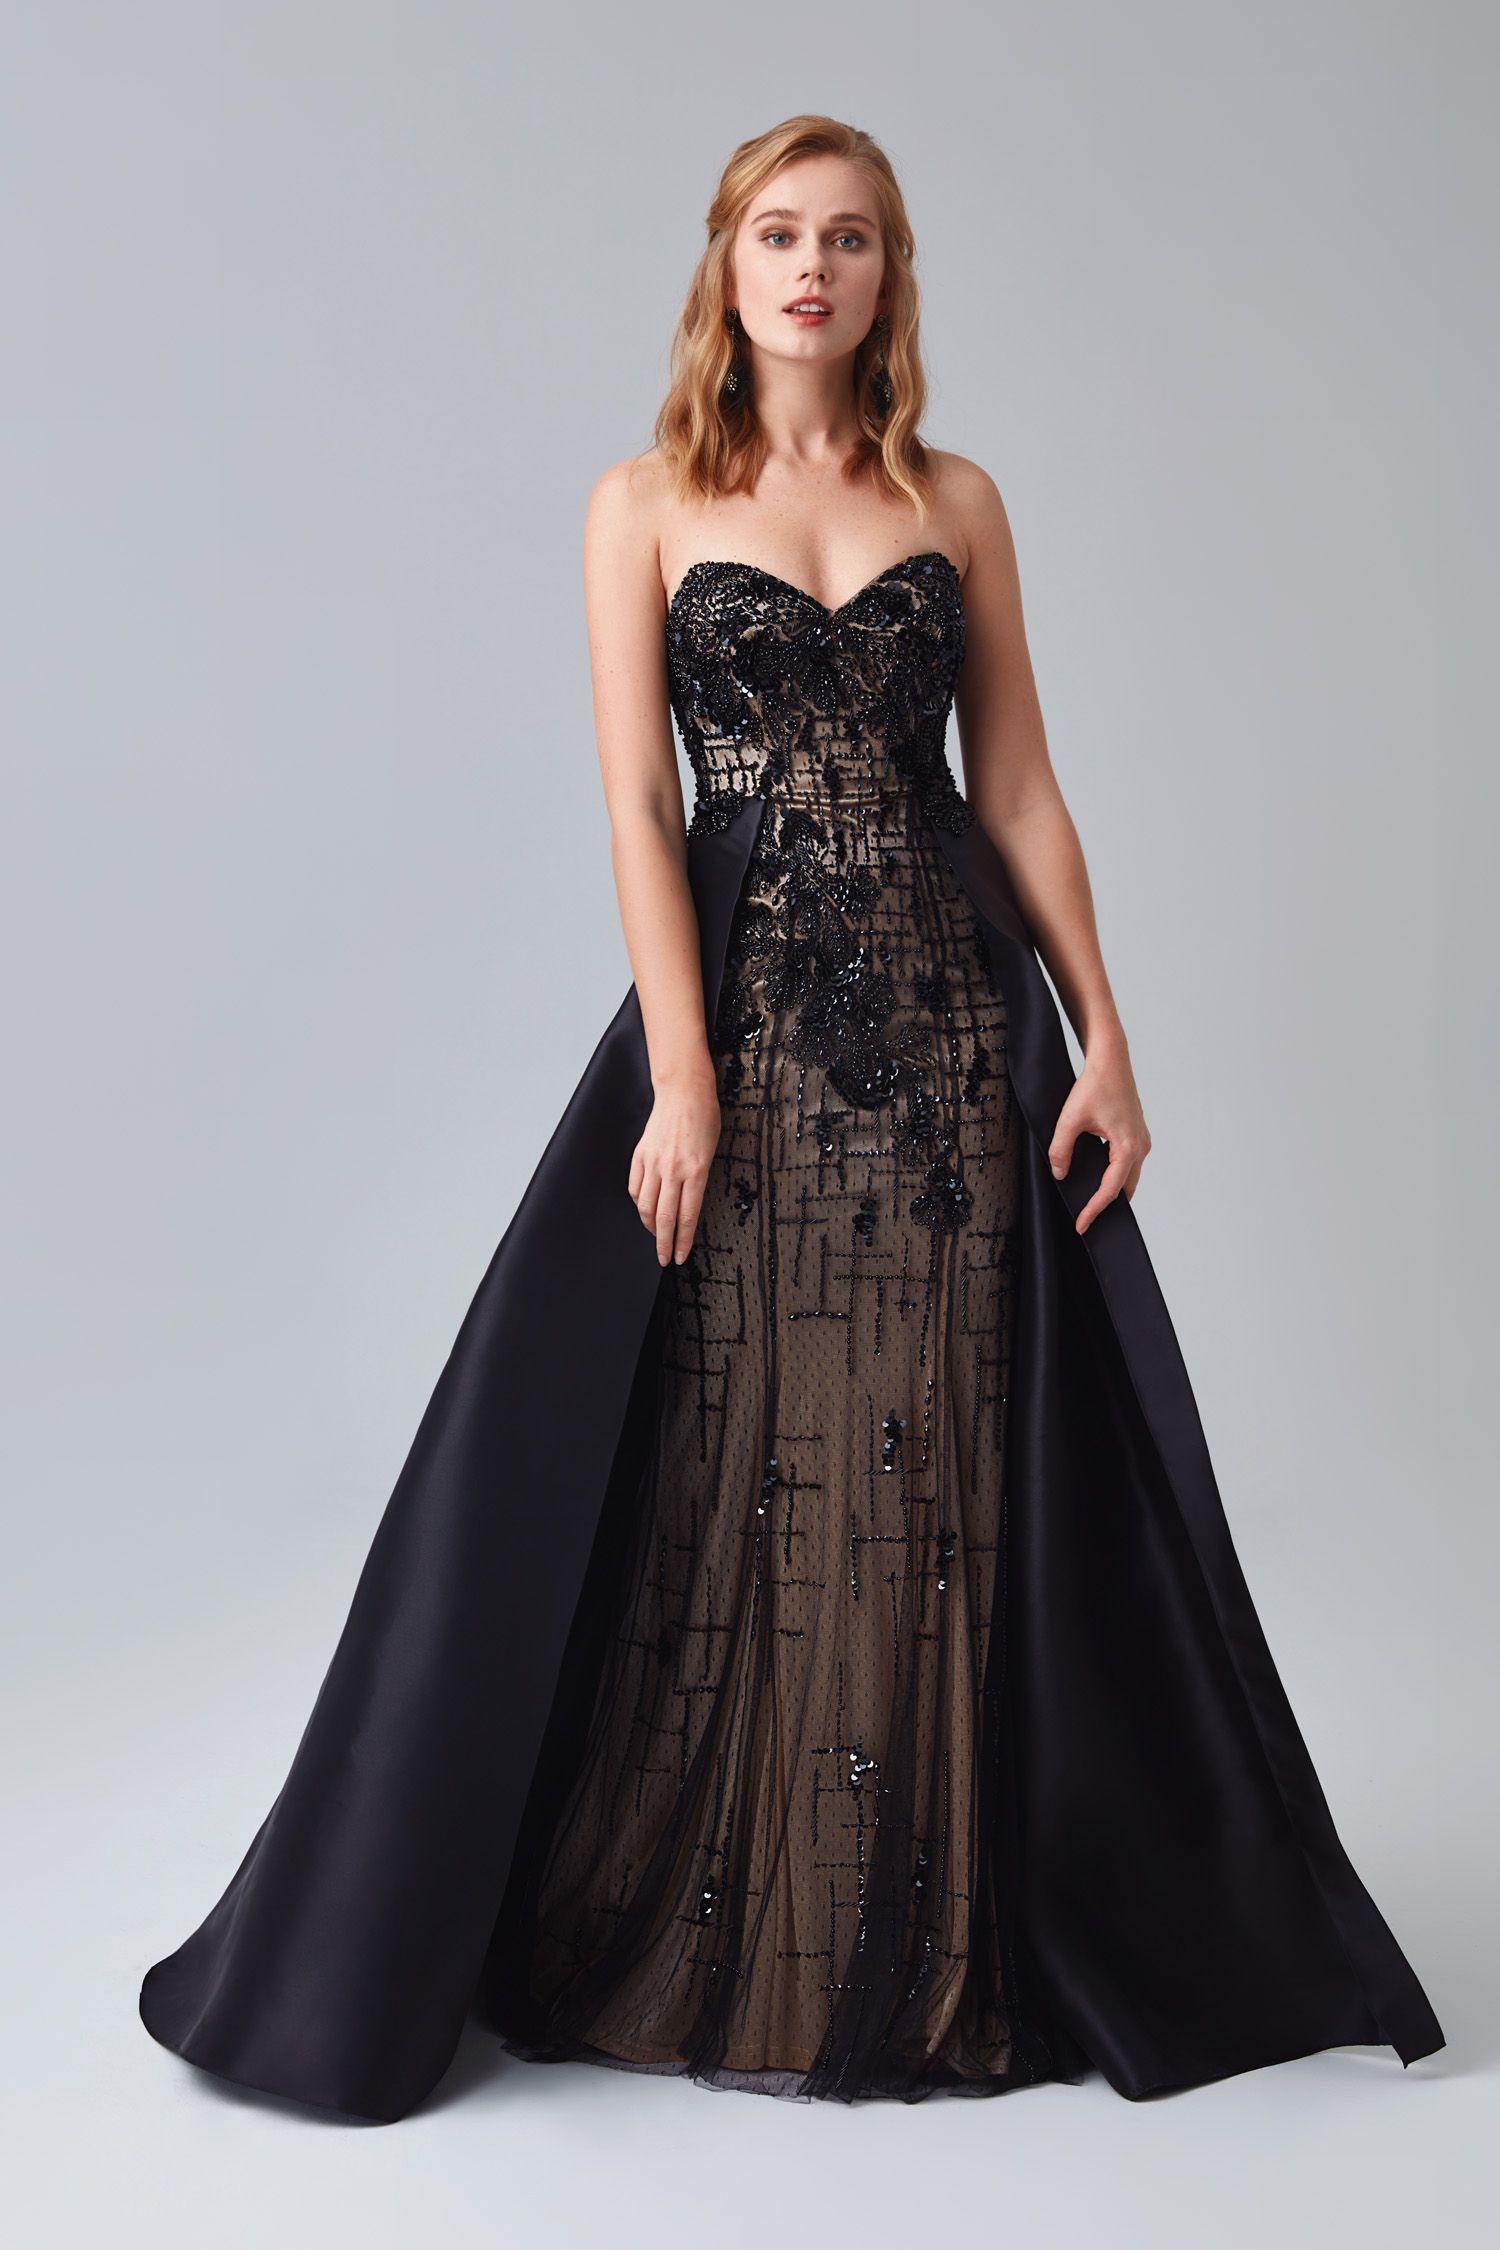 Siyah Straplez Katli Etek Abiye Elbise Mezuniyetelbisesi Mezuniyetkiyafetleri Mezuniyetabiye 2018mezuniyetelbiseleri Elbise Modelleri Elbise Resmi Elbise